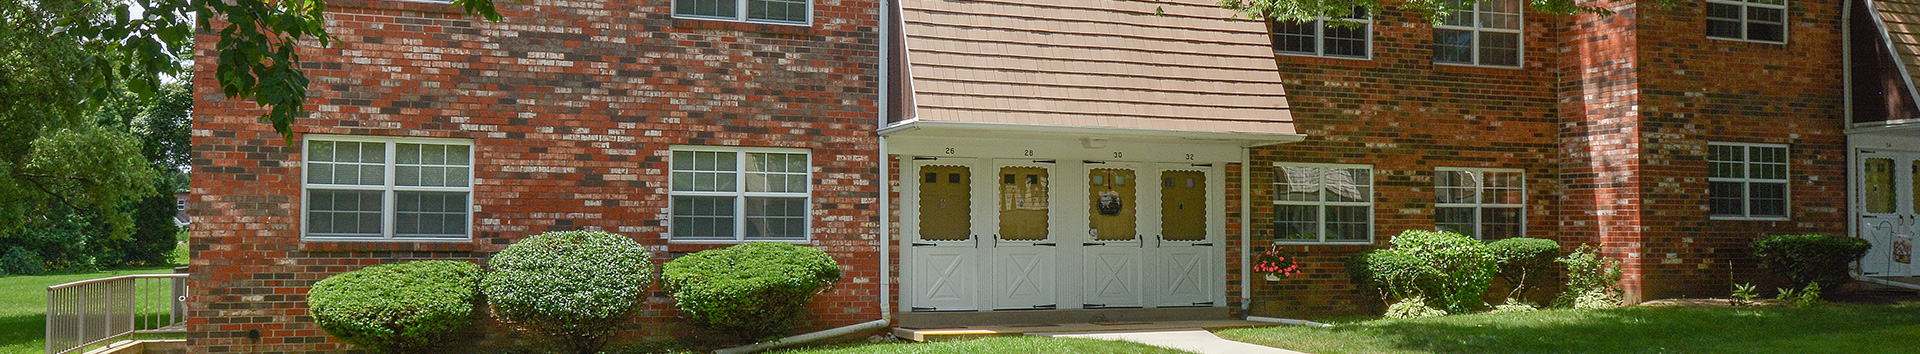 Exterior view of Springetts Apartments at Manor Communities, York/Pennsylvania